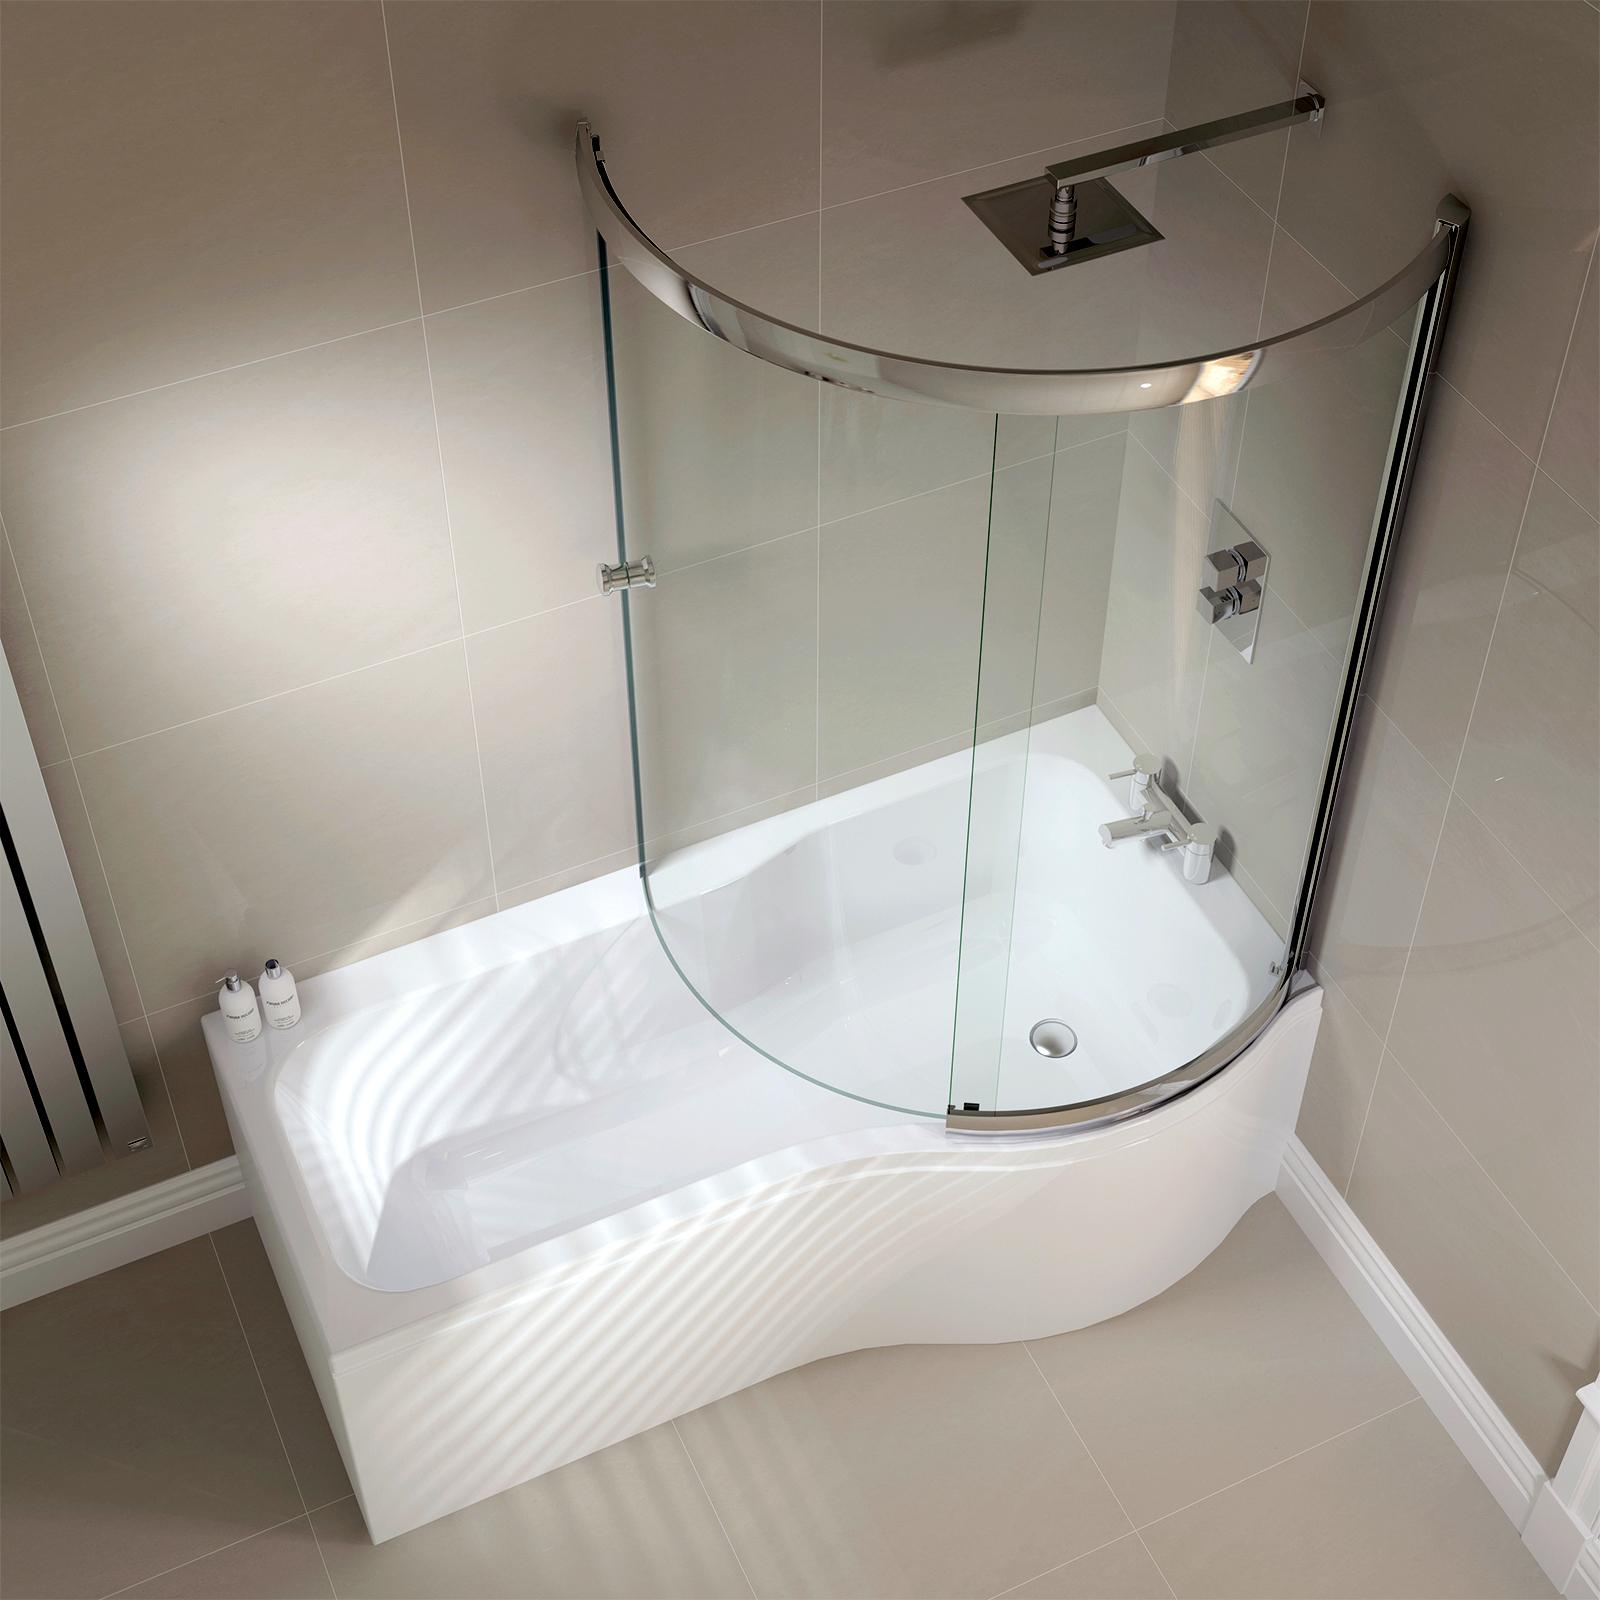 Uk BATHROOMS : UK Bathrooms